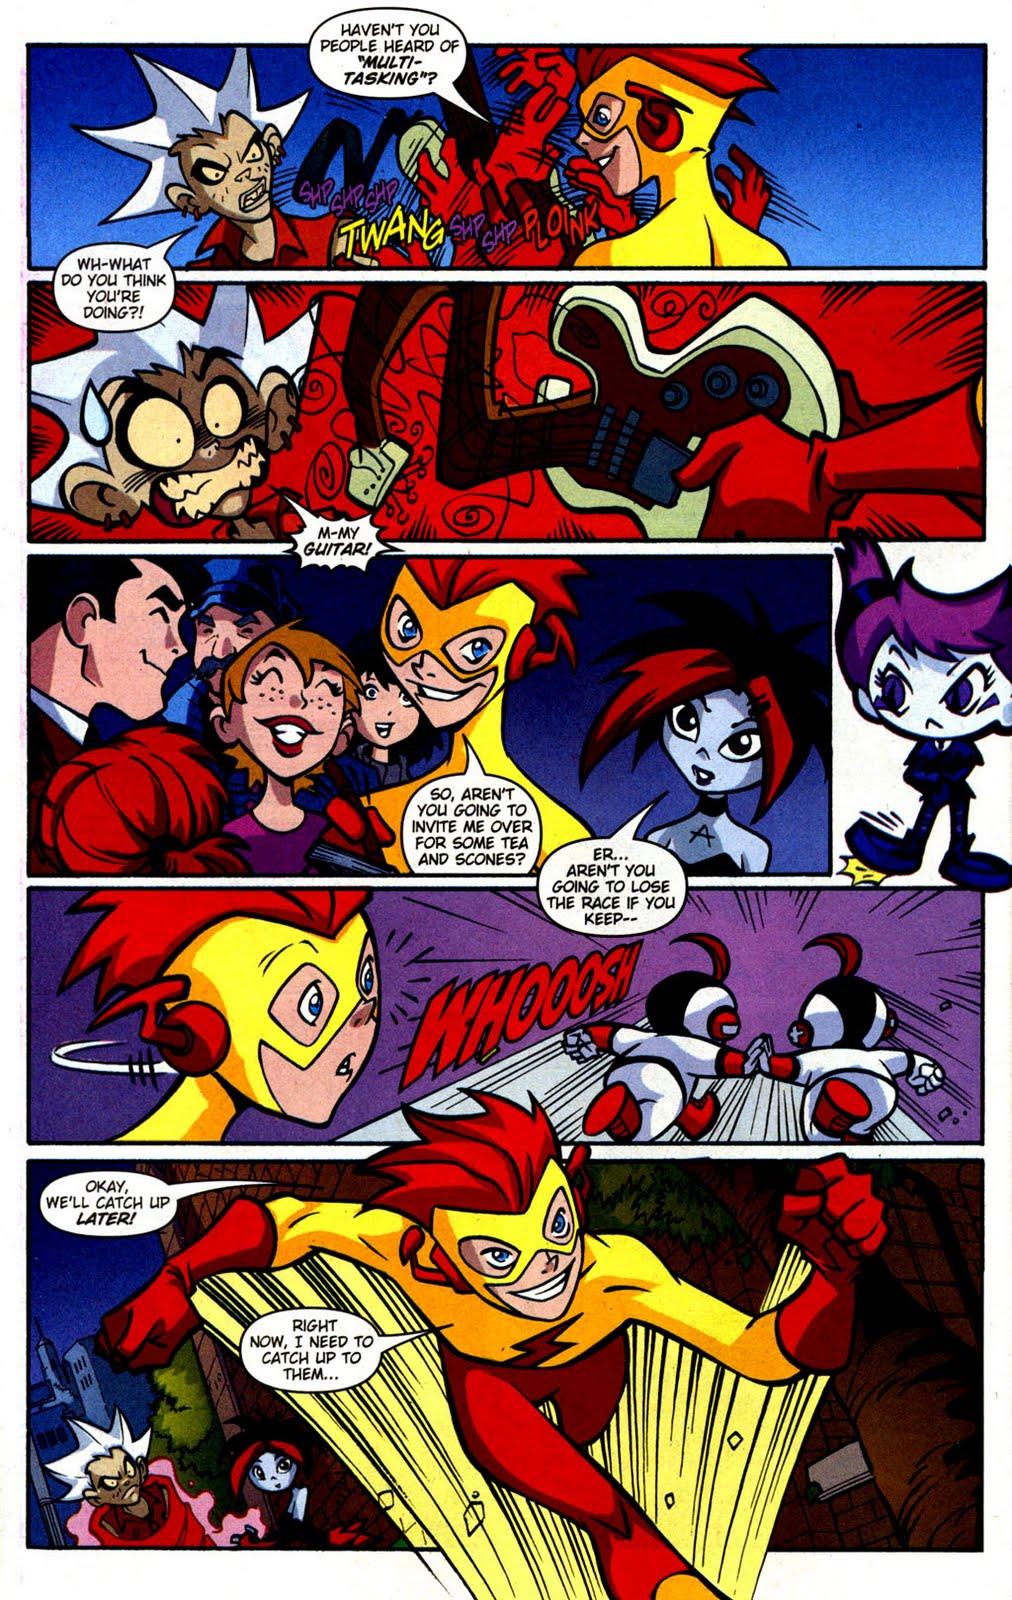 Teen Titans Go! (TM): Meet the Teen Titans! (Passport to Reading Level 2) by Luc